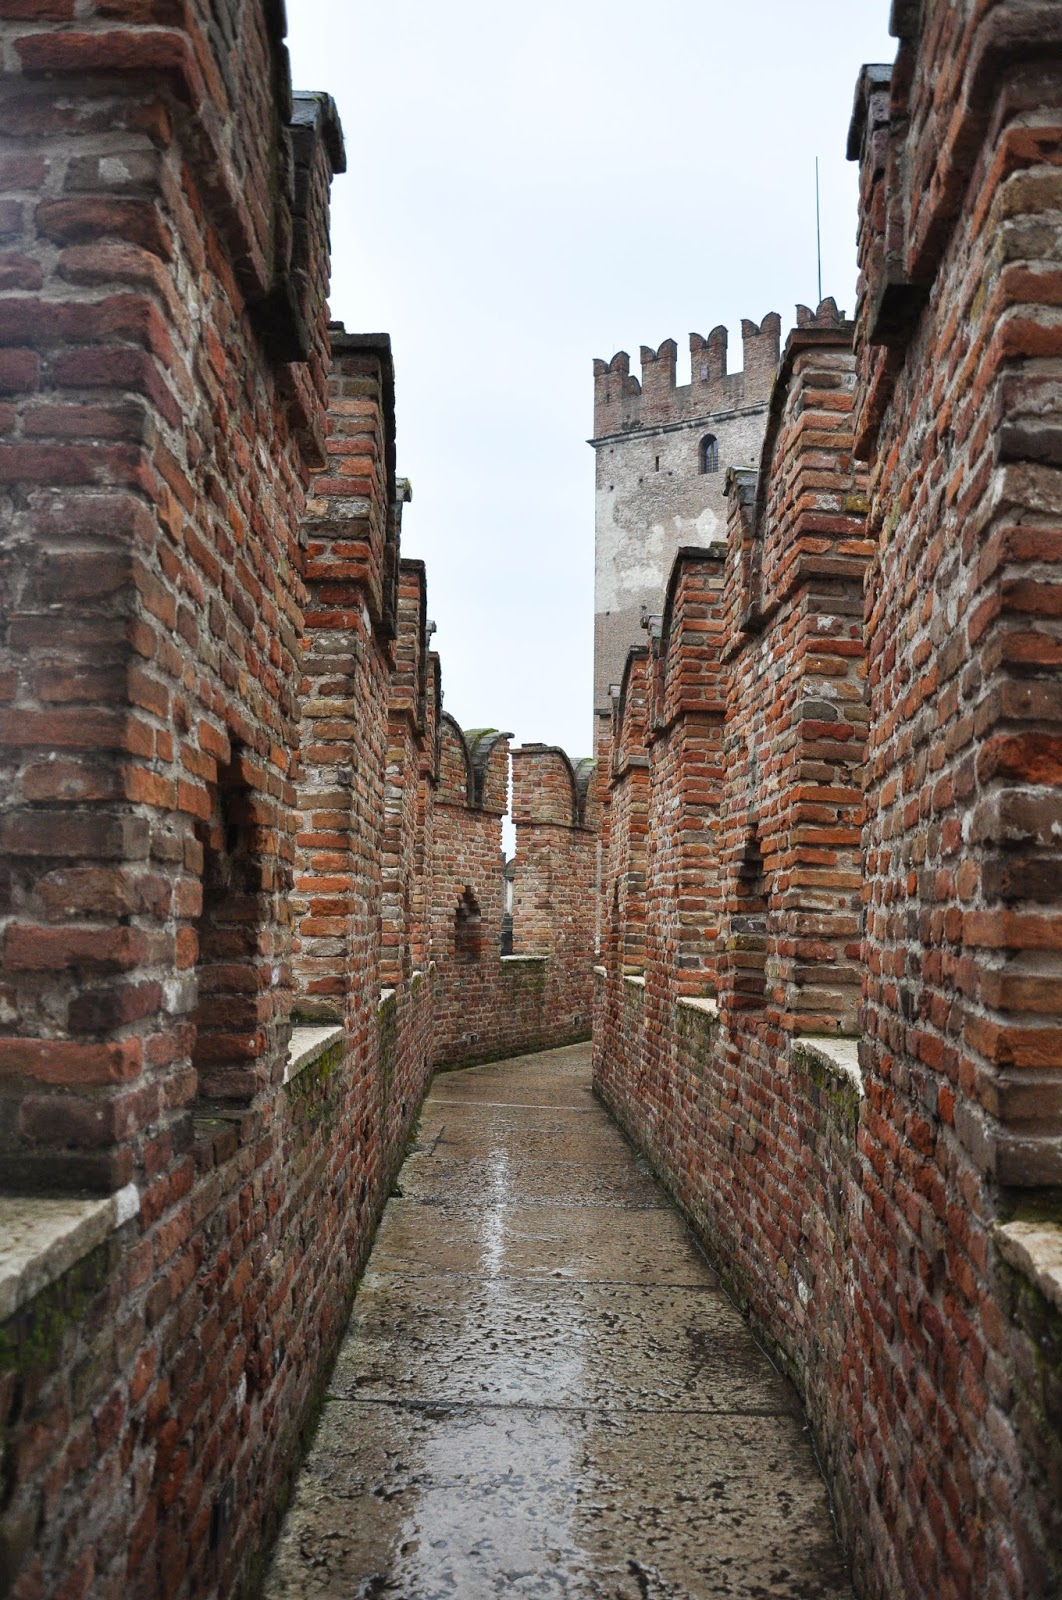 Among the battlements of Castelvecchio in Verona